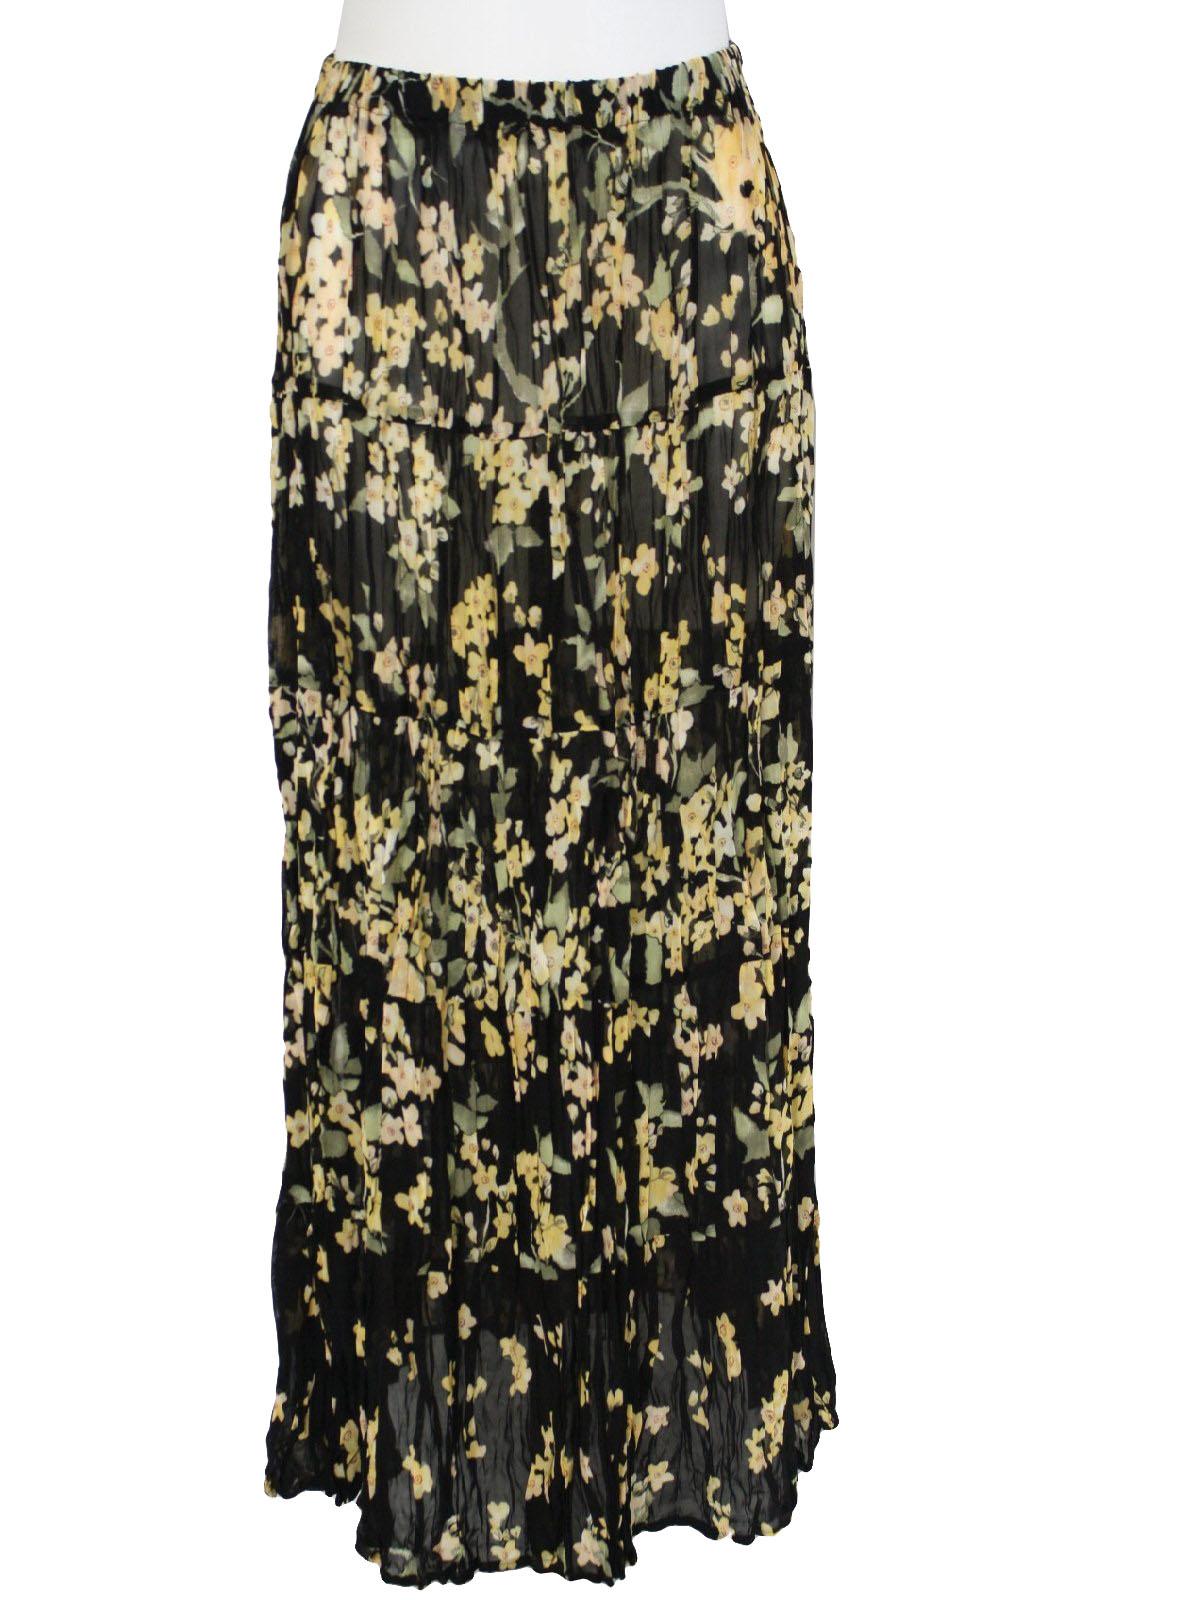 vintage carole little designer 90s hippie skirt 90s